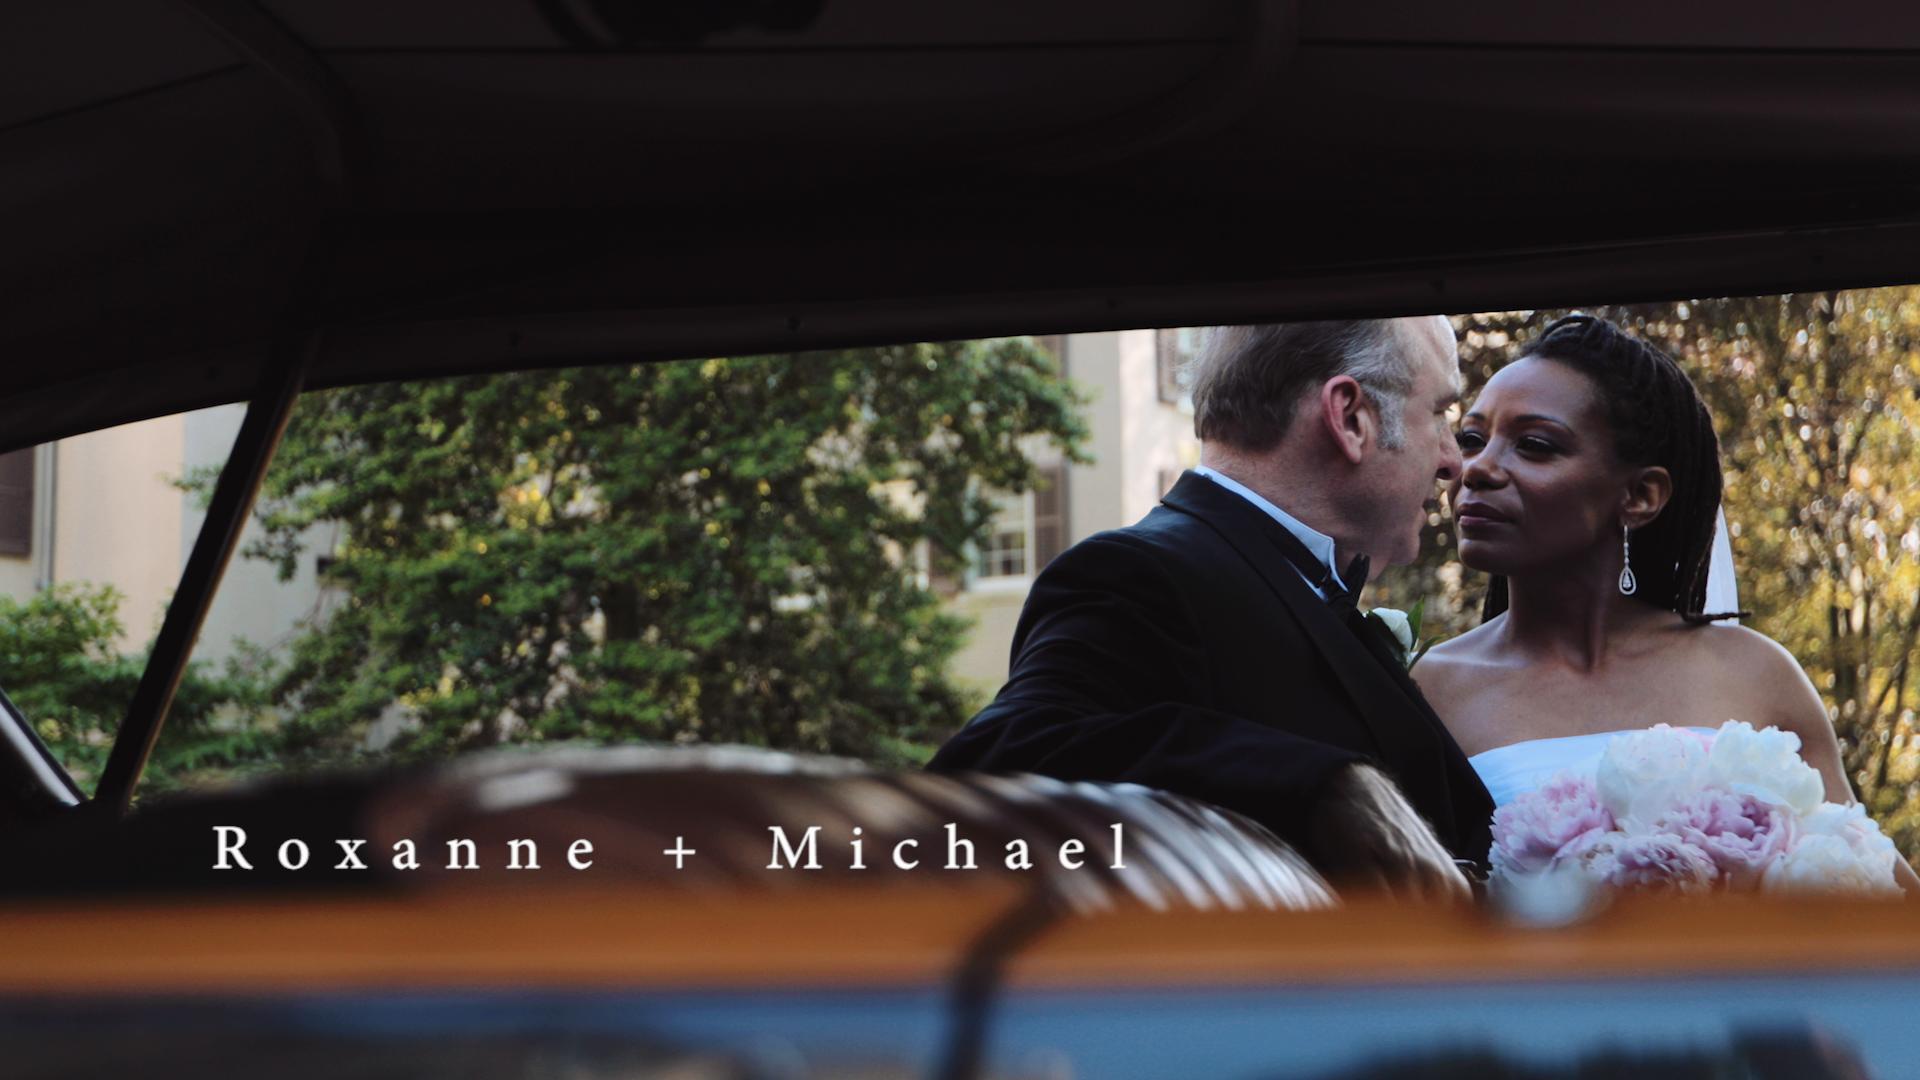 Roxanne and Michael.jpg